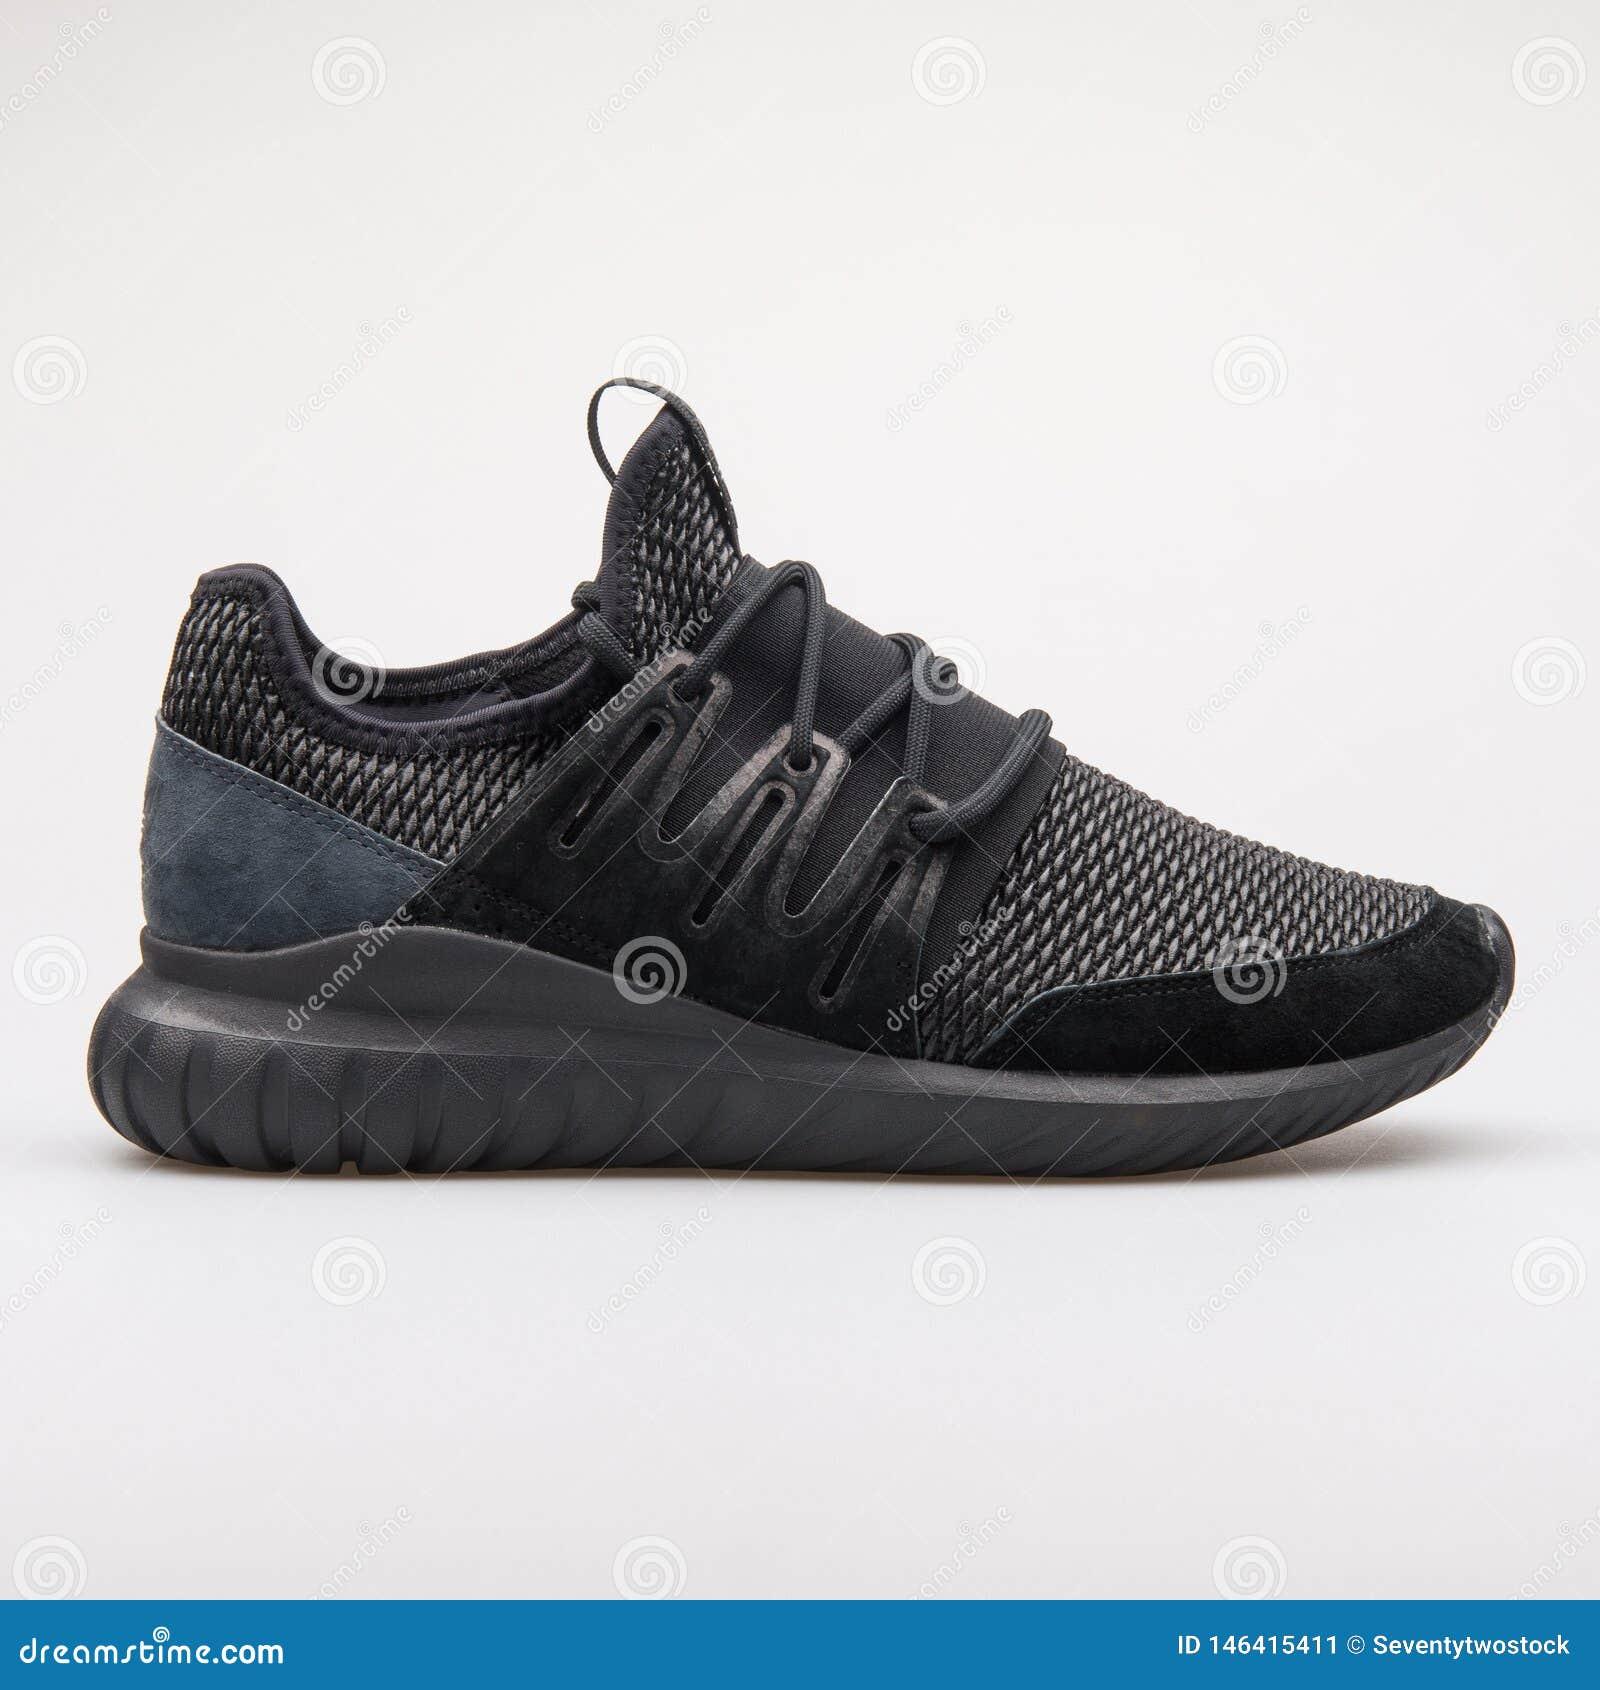 brand new 255d8 363ed Adidas Tubular Radial Black Sneaker Editorial Photo - Image ...